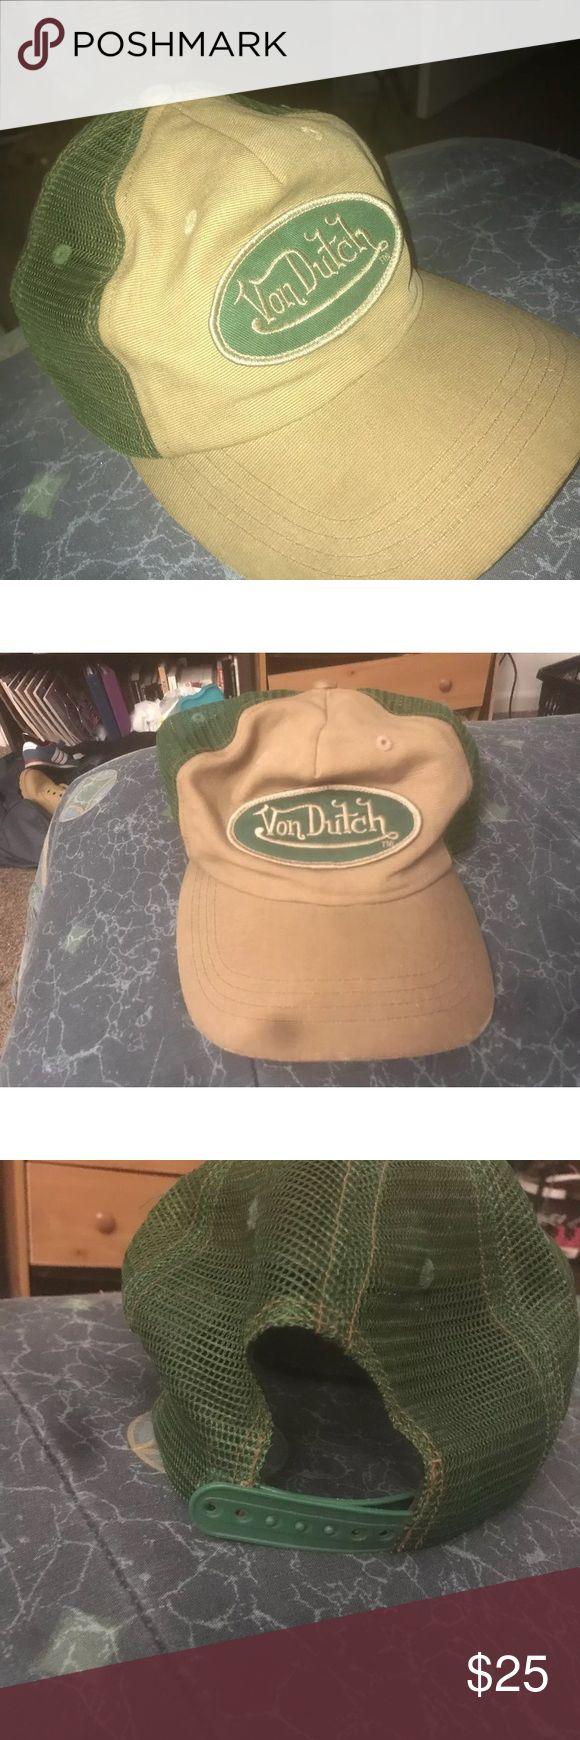 Von Dutch Vintage Trucker Hat Pre owned  Good condition 25 or best offer Christian Audigier Other